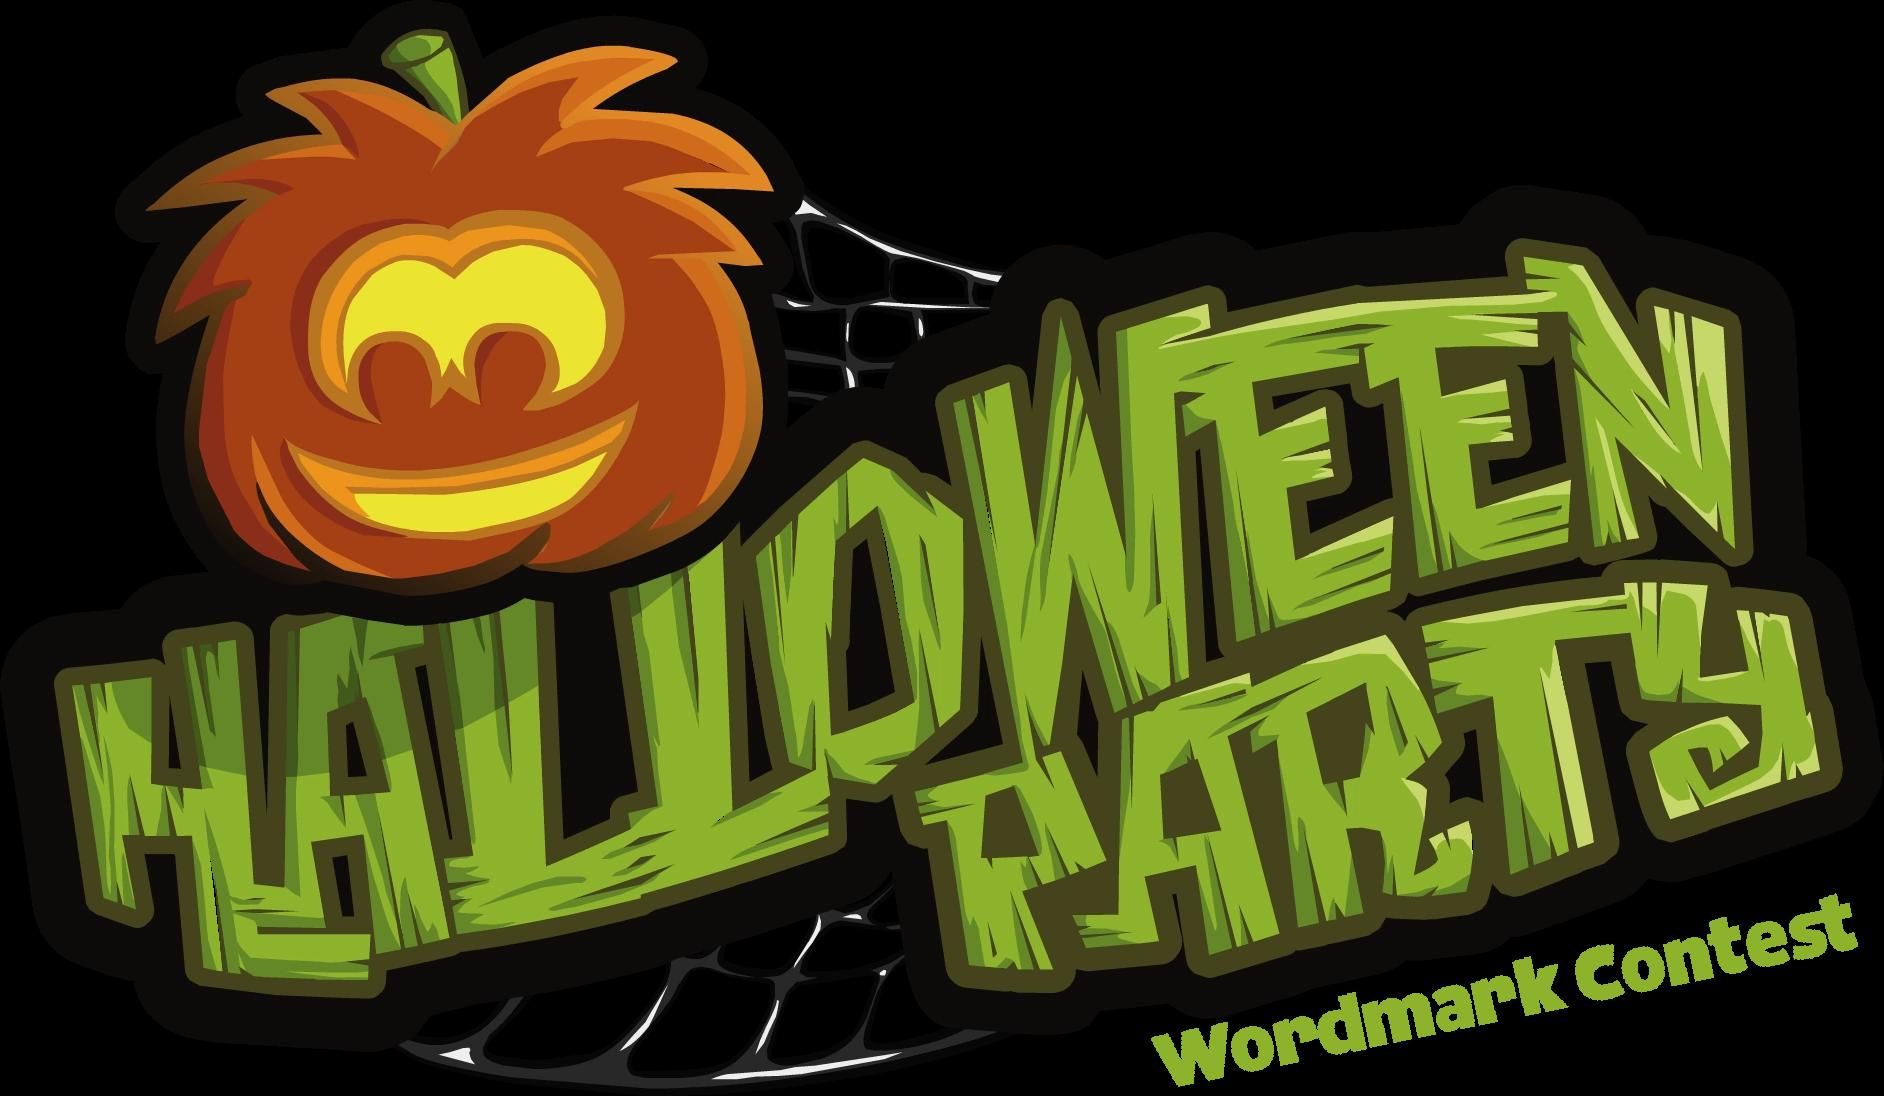 Lataus/Halloween Party 2018 Wordmark Contest!